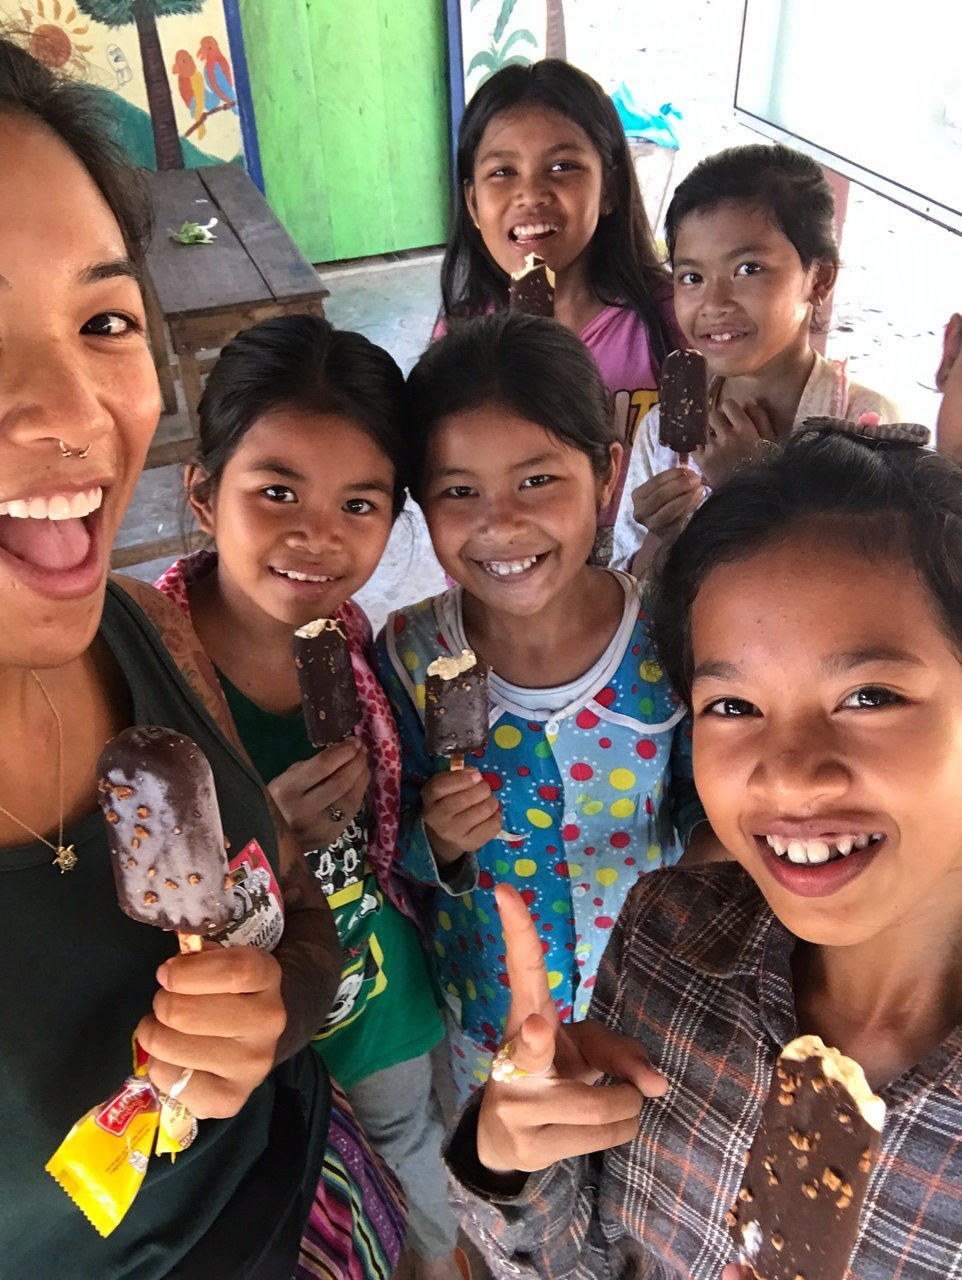 ice cream with the kids